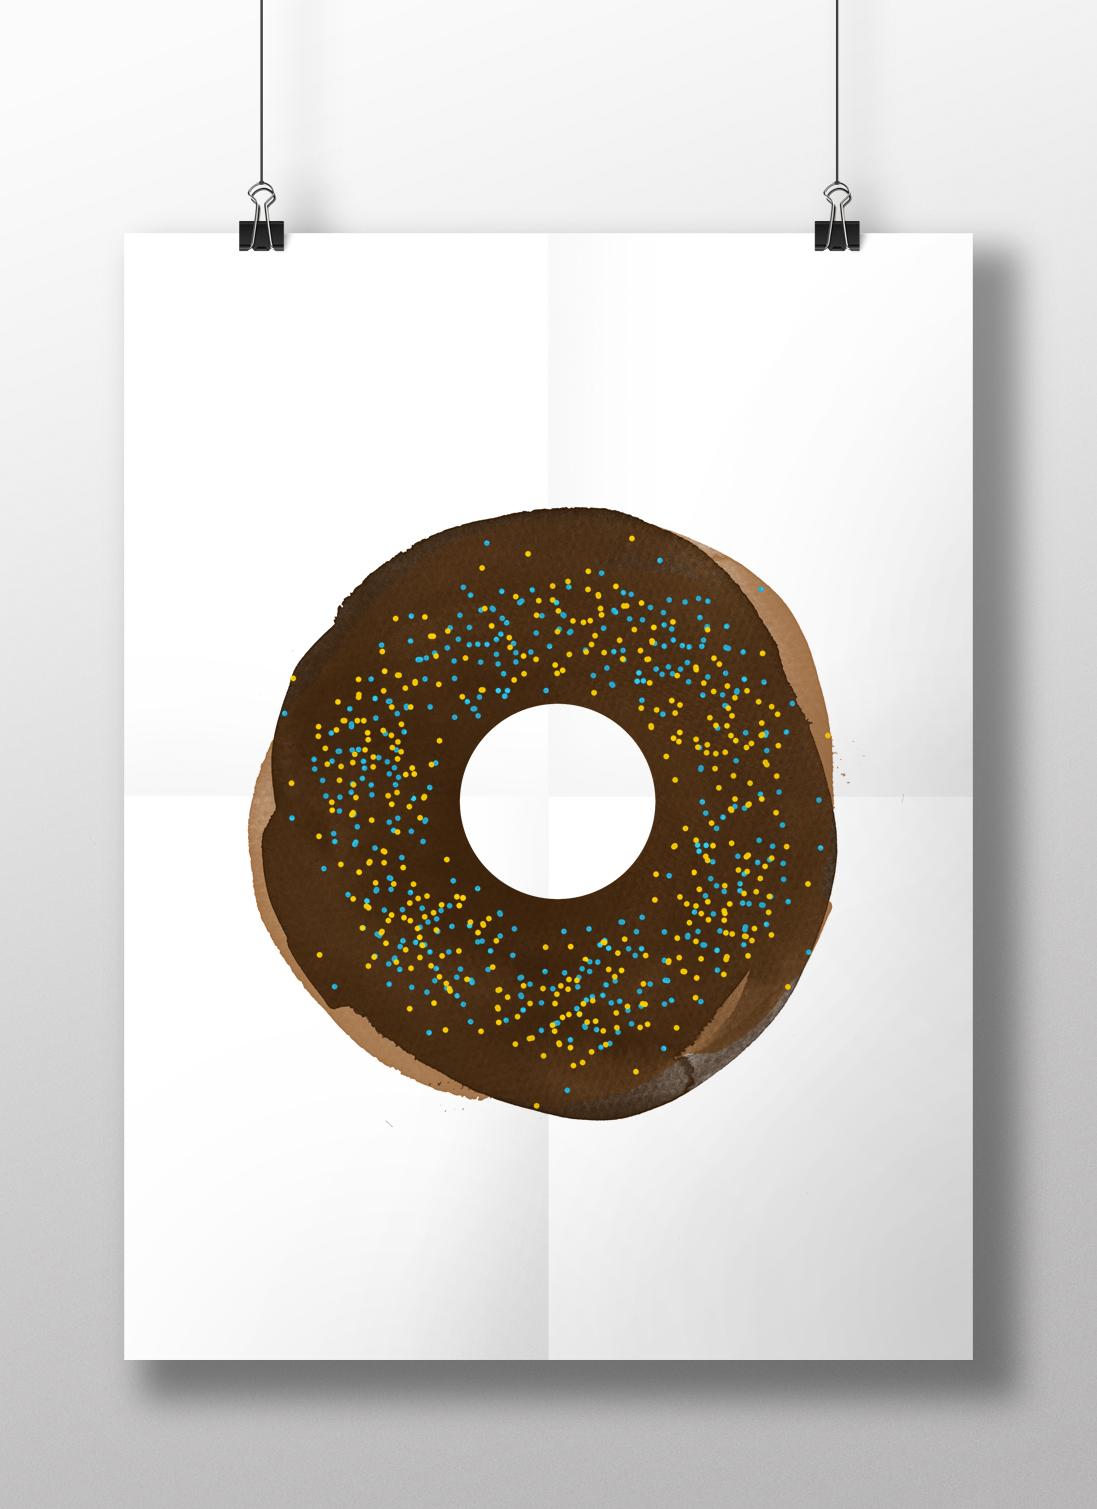 donut series